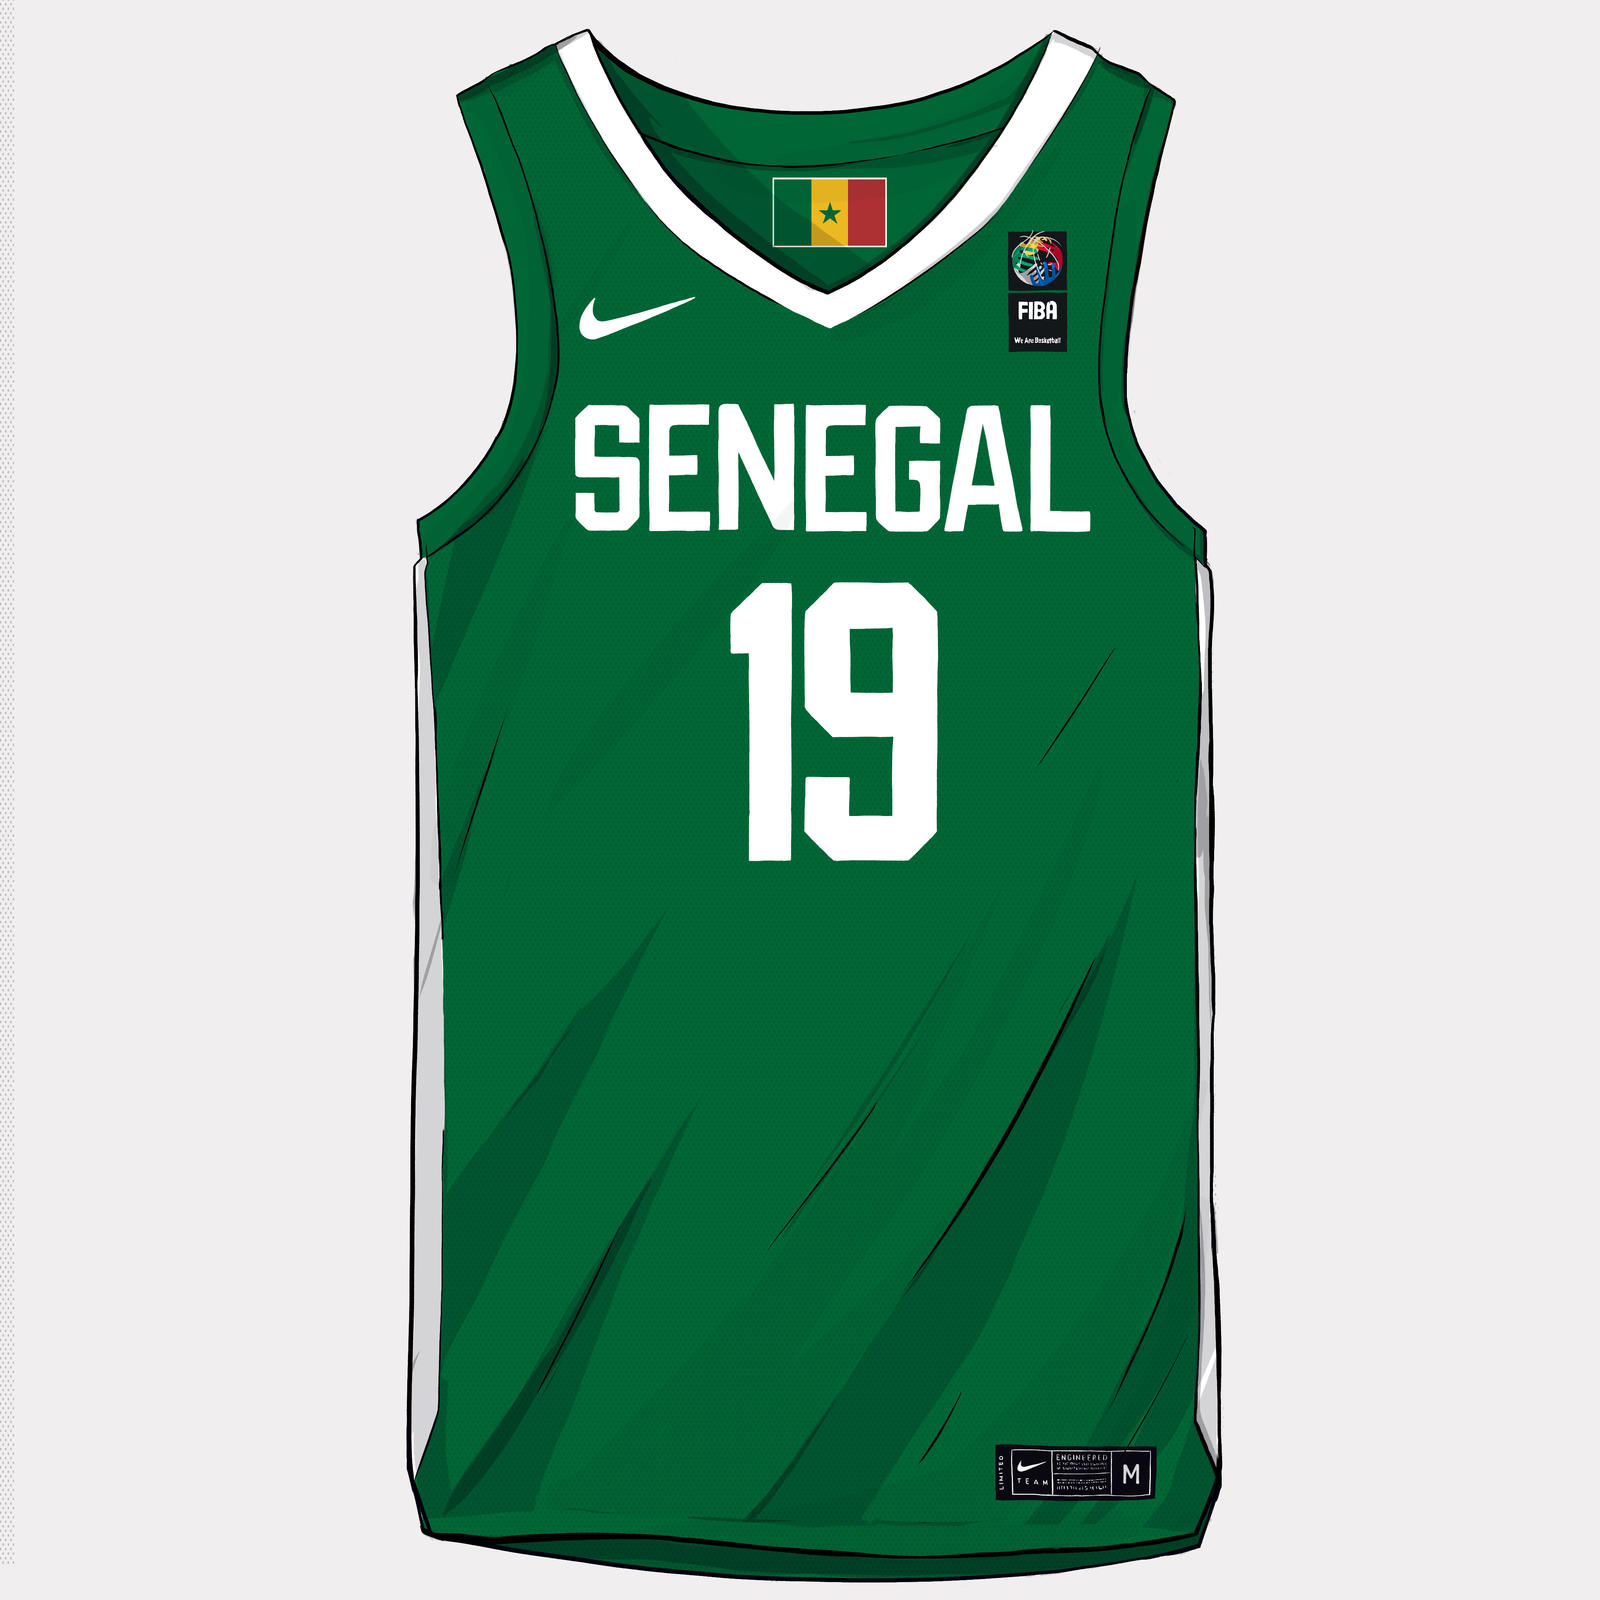 quality design 7aaea ad890 2019 Nike & Jordan Brand Basketball Federation Uniforms ...